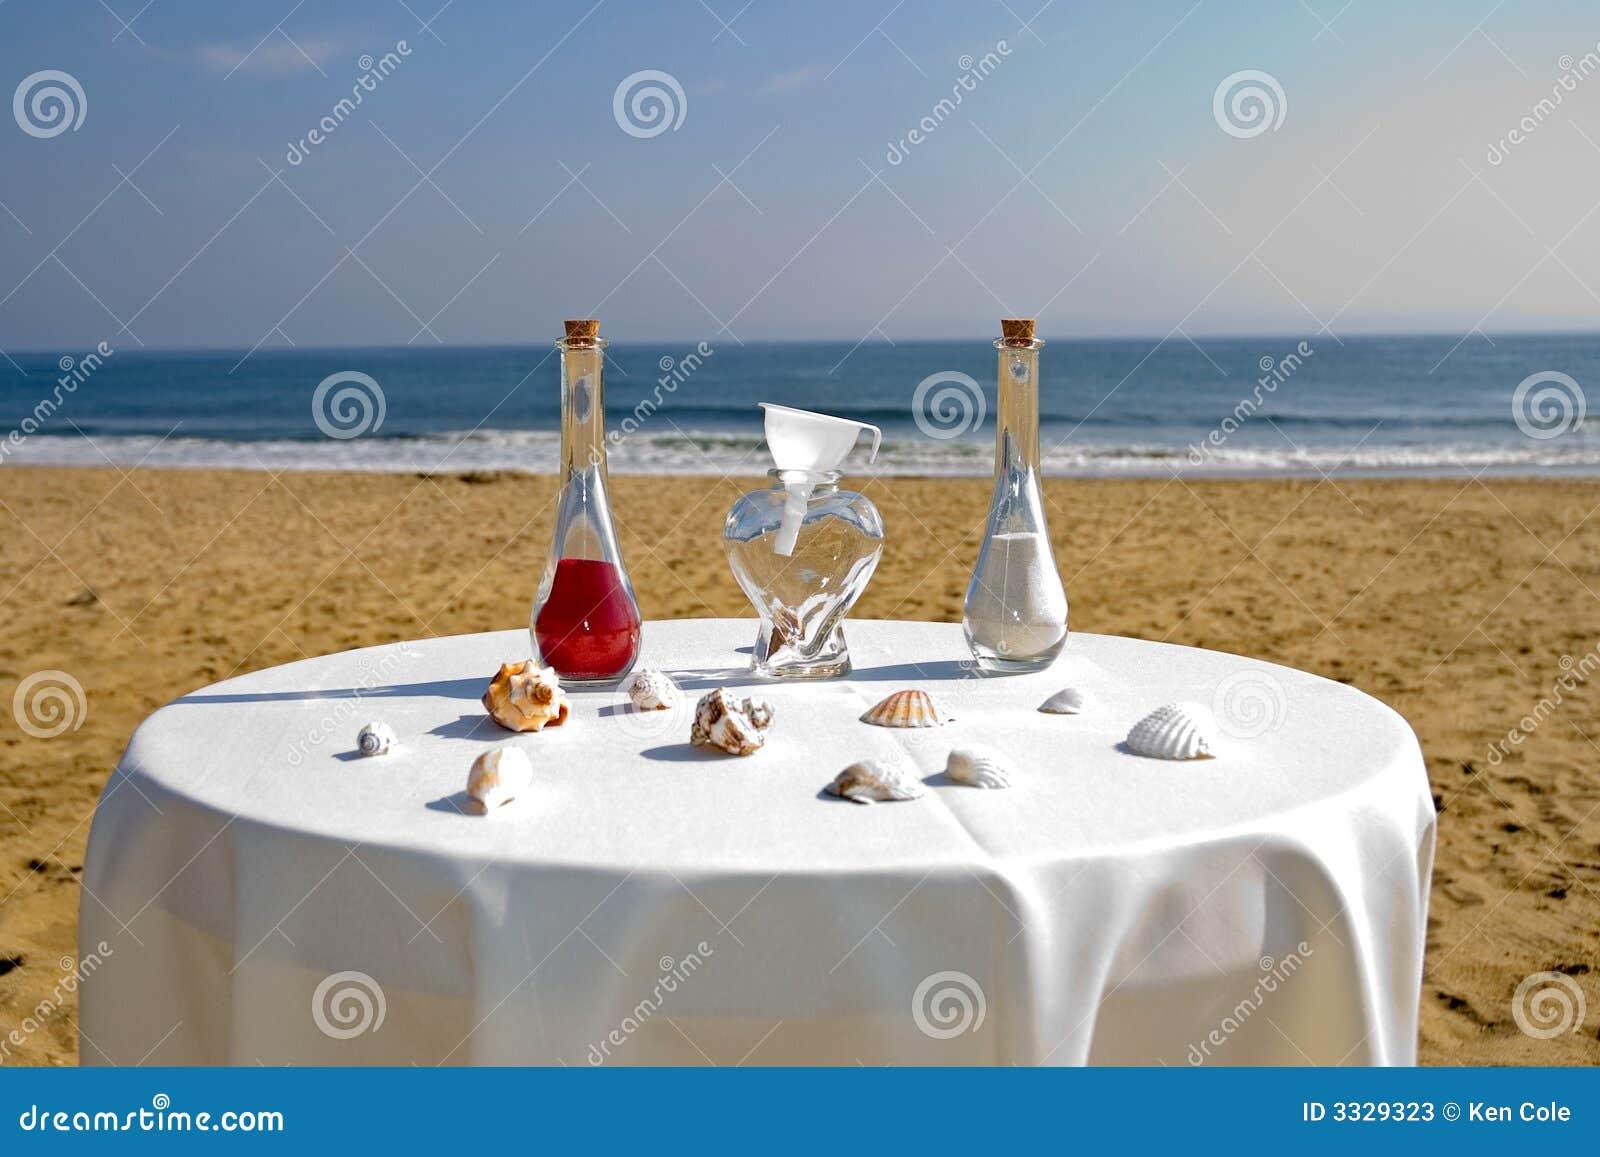 Beach wedding ceremony stock image Image of